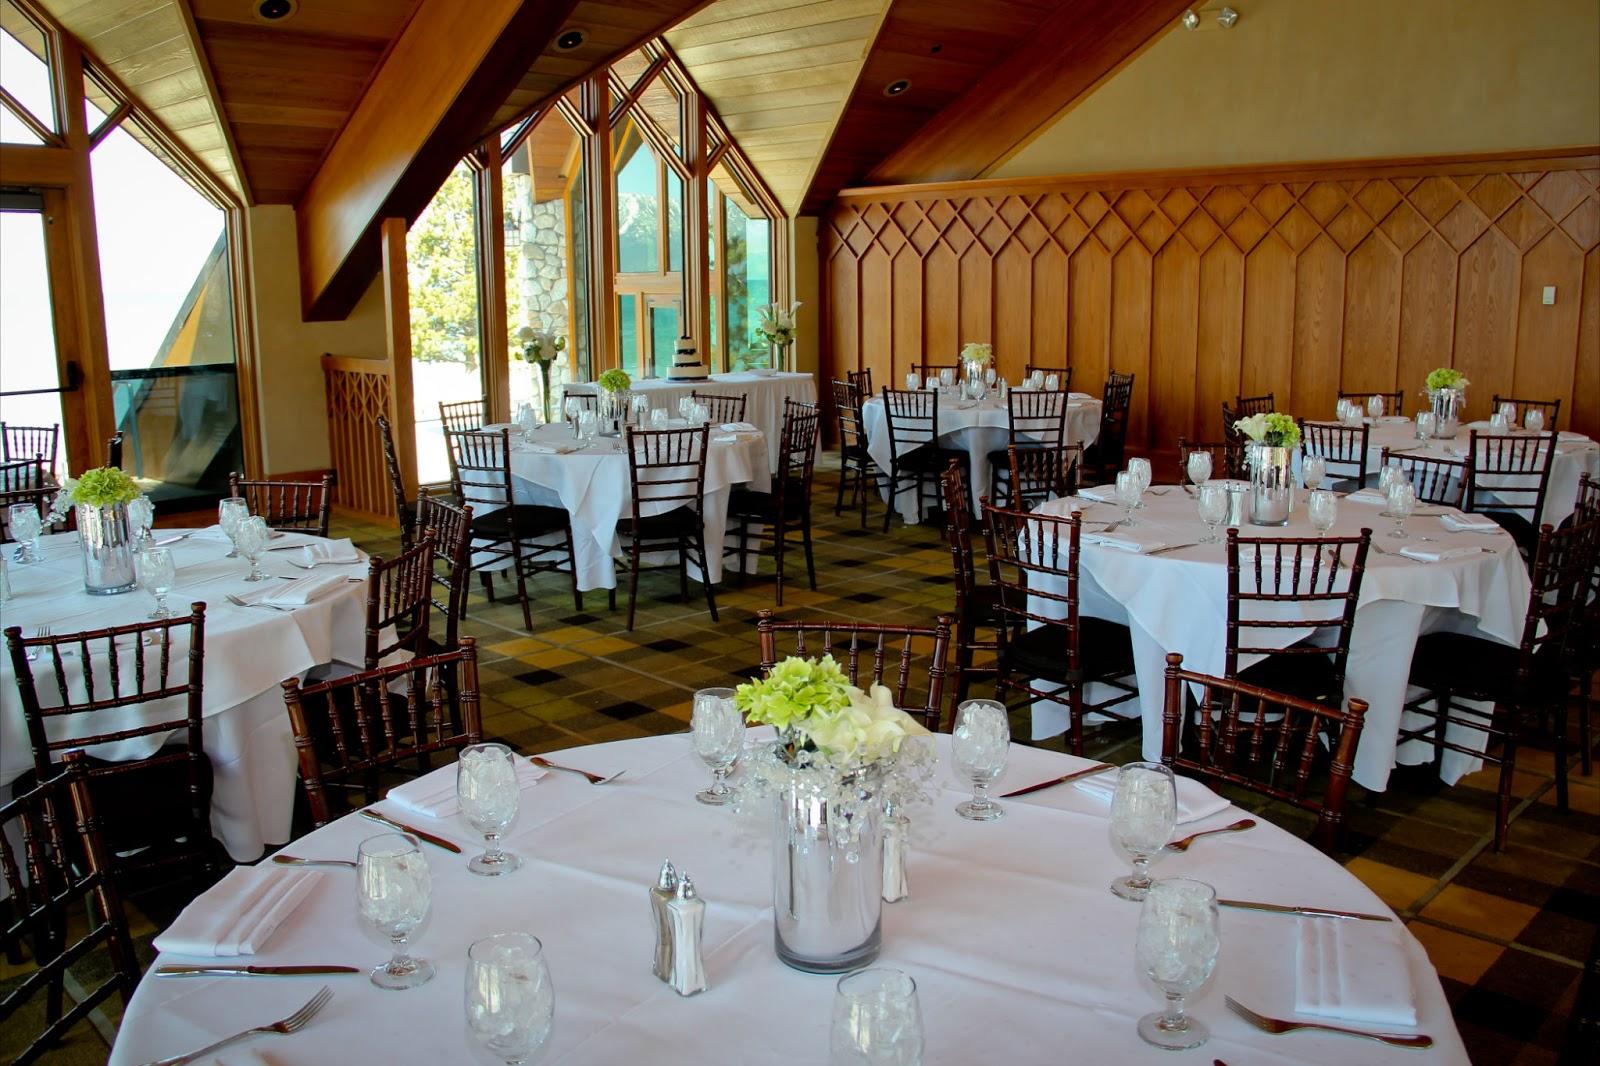 Wedding Reception Venues In South Lake Tahoe